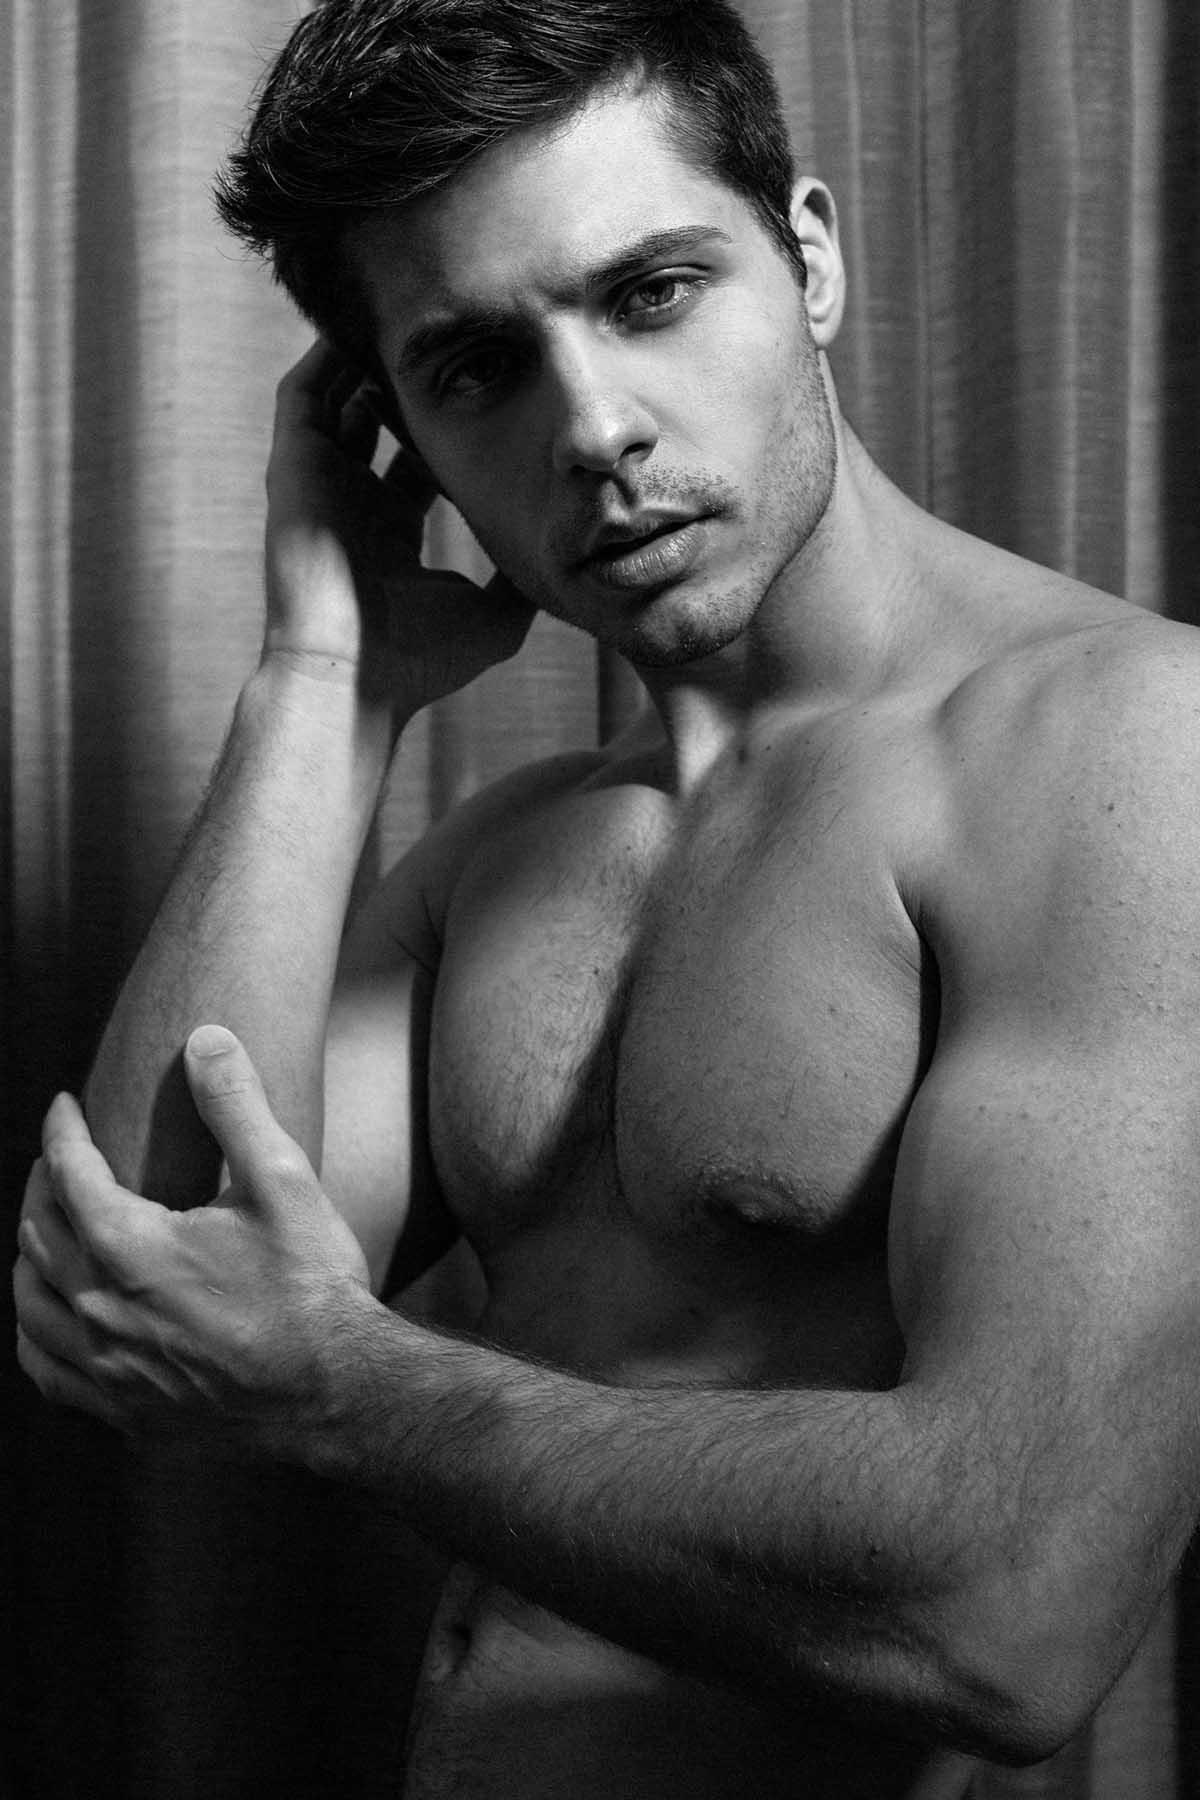 Eduardo Gasparoni by Danilo Friedl for Brazilian Male Model